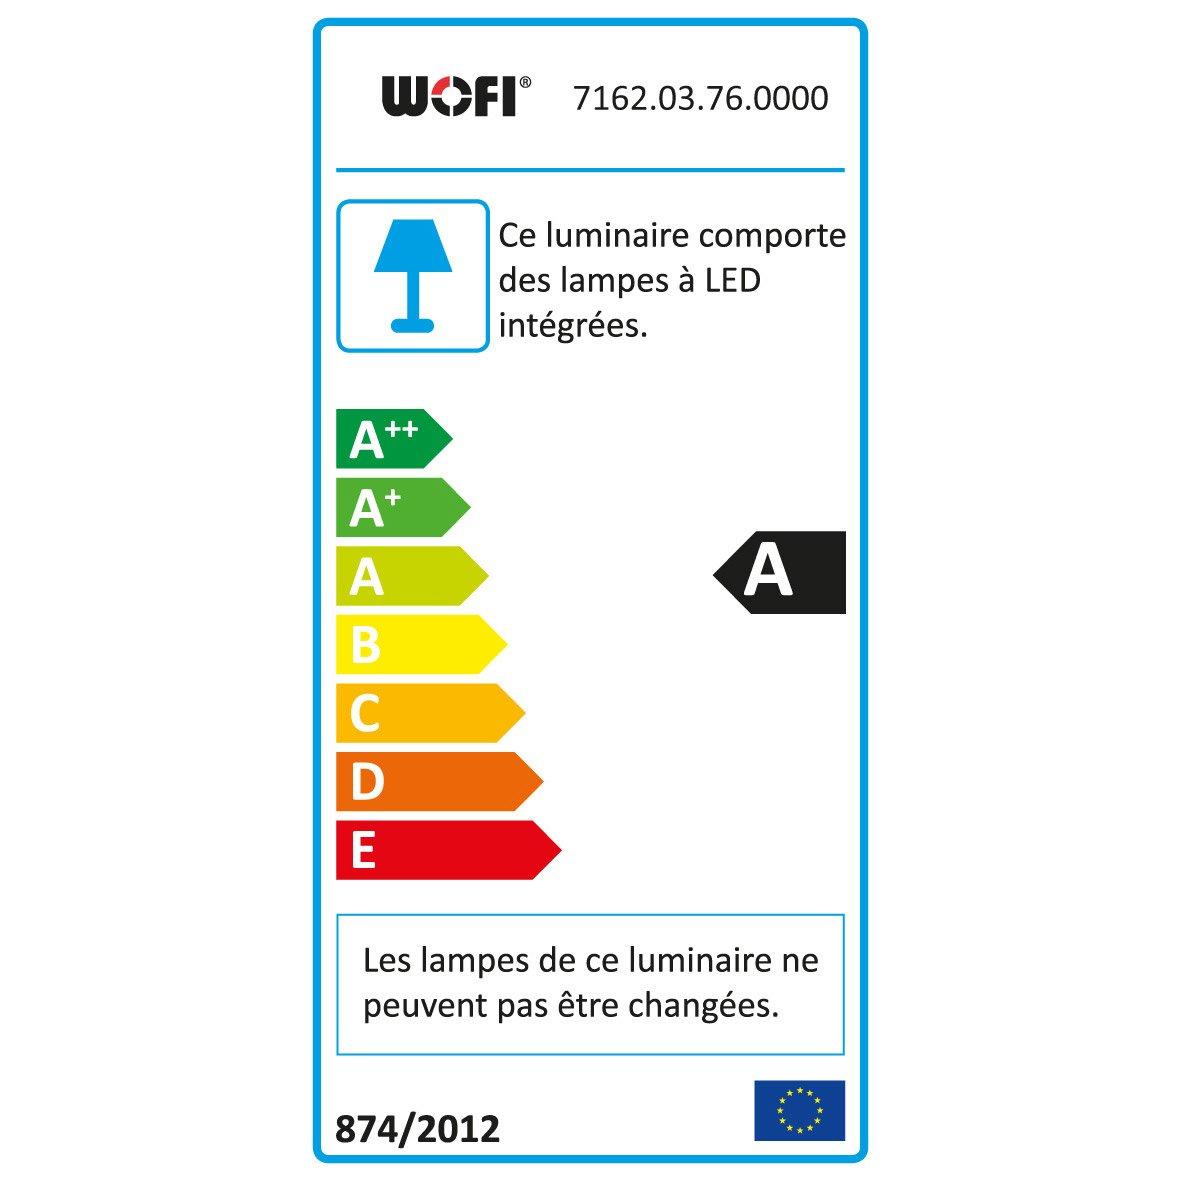 Wofi Intégrée X Segura Oxydé 3 W 36 Mat Design SuspensionLed Métal Nickel QeEoWCrdxB